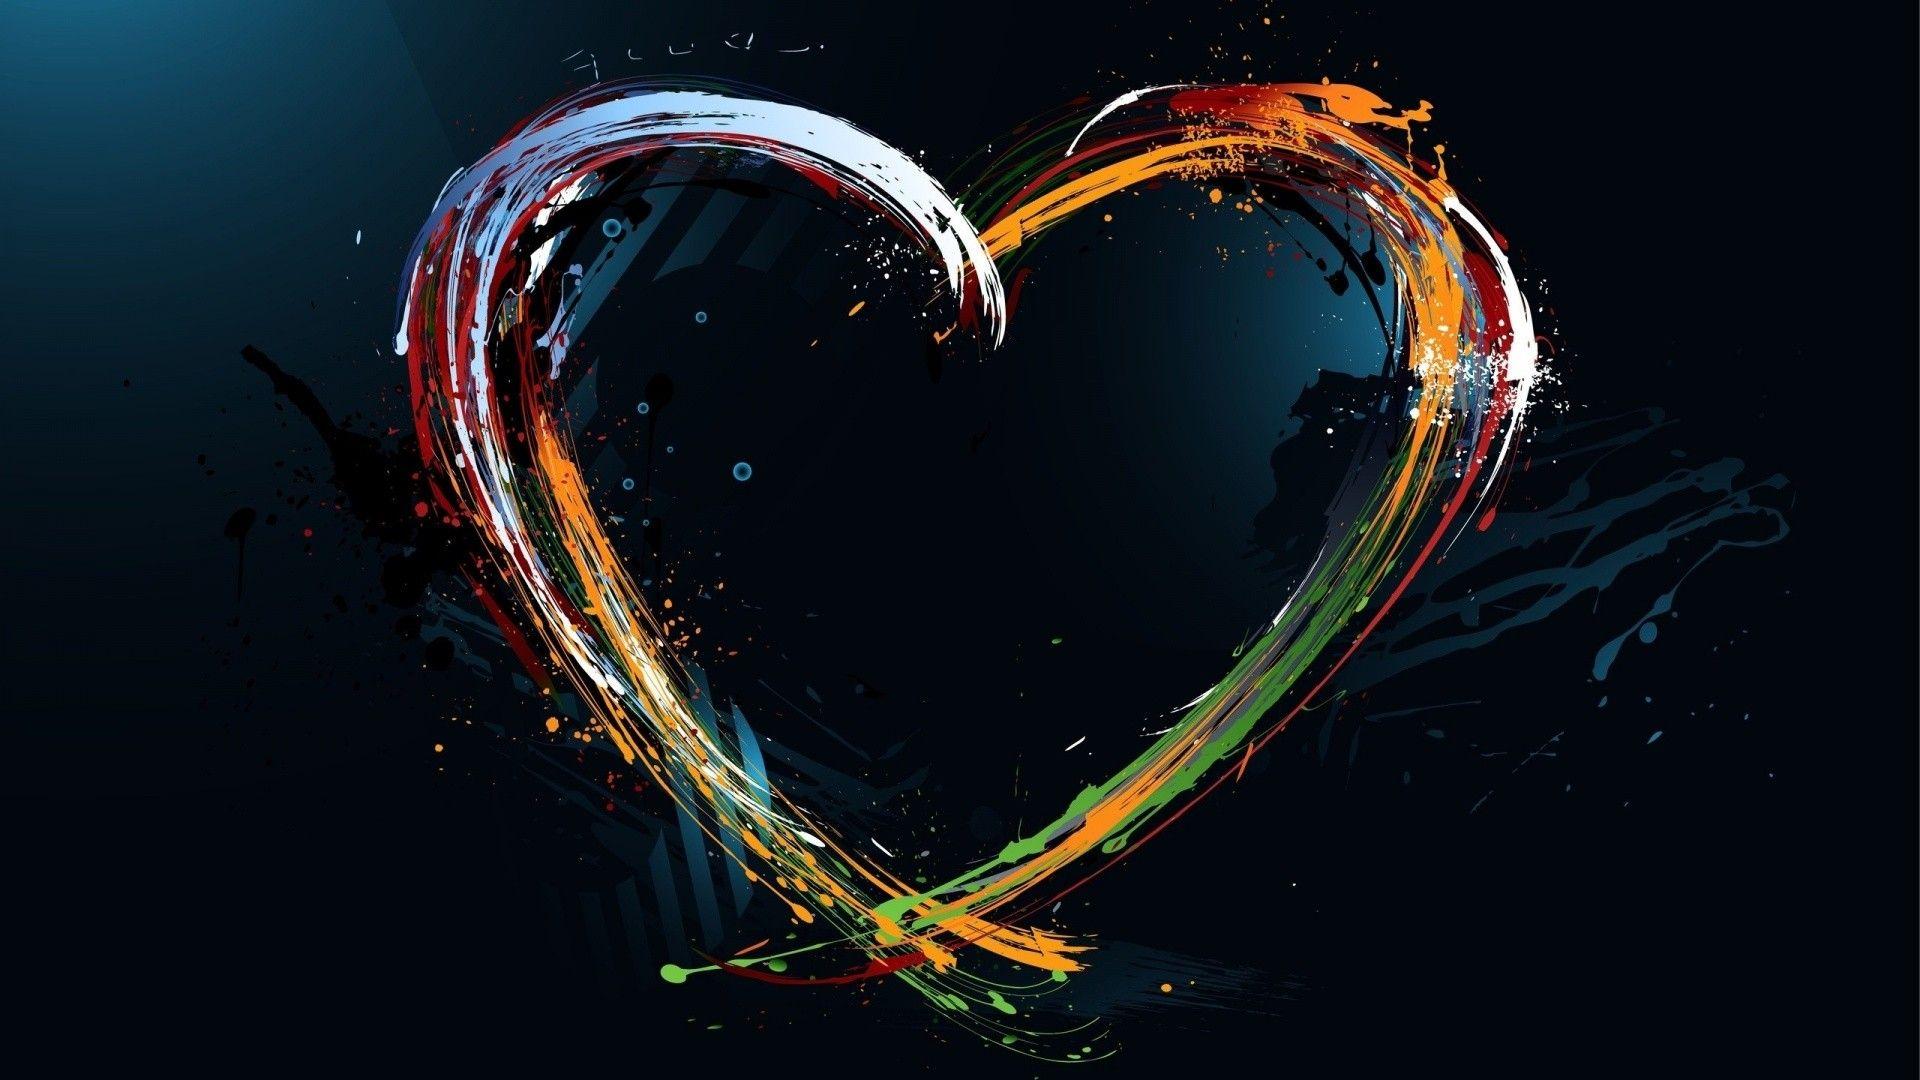 Heart Abstract, Abstract Hearts